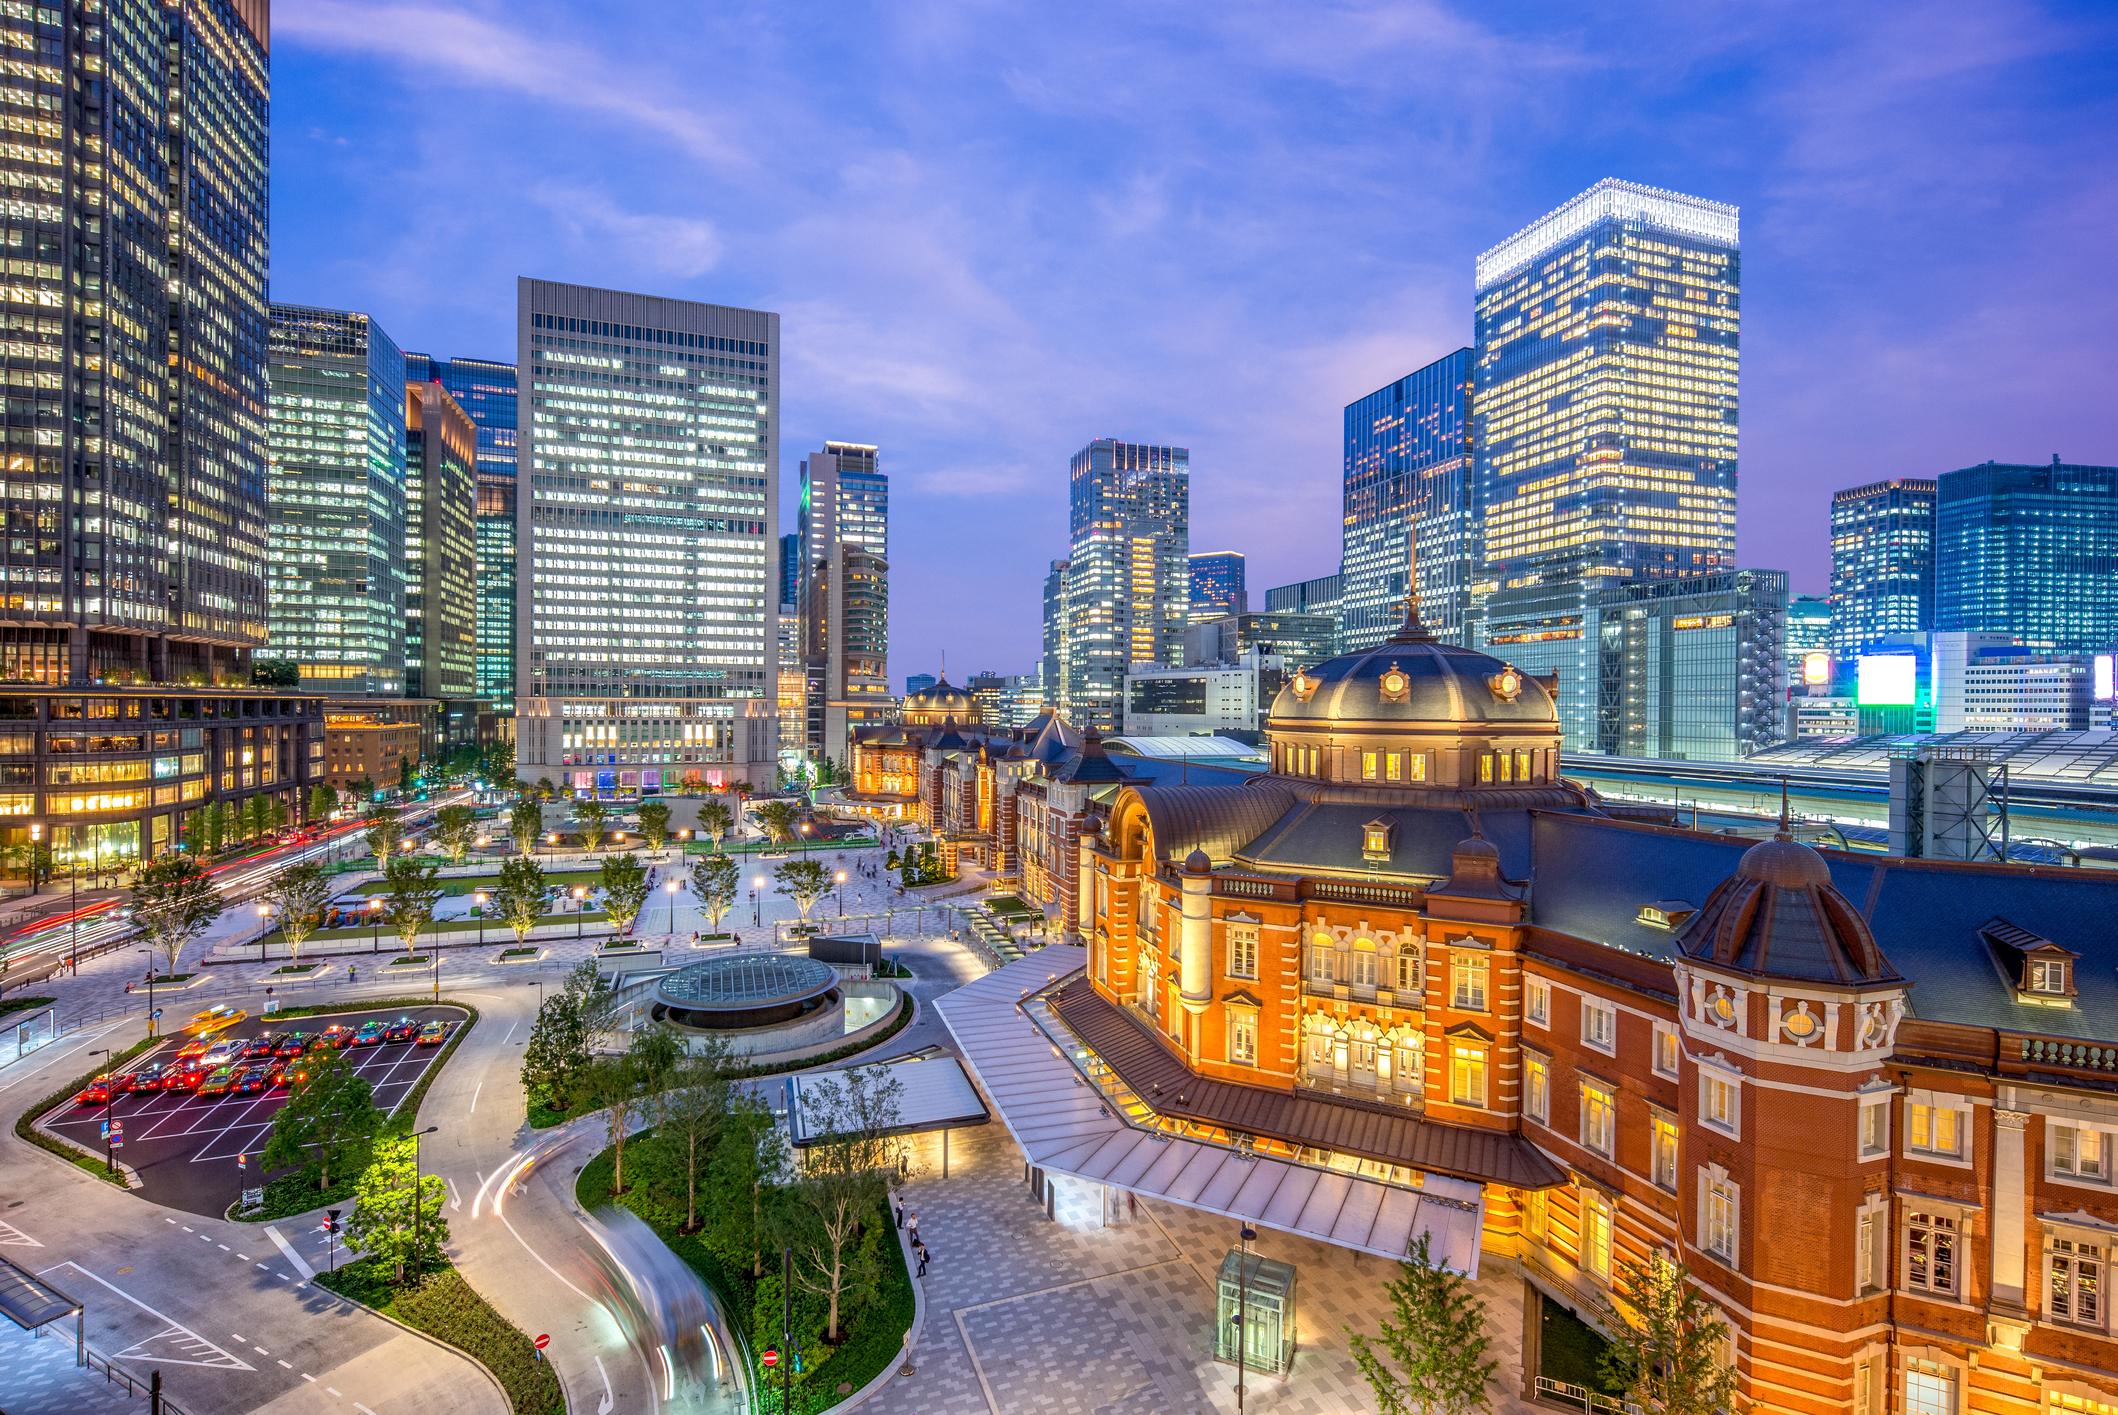 50 reasons why we love Tokyo